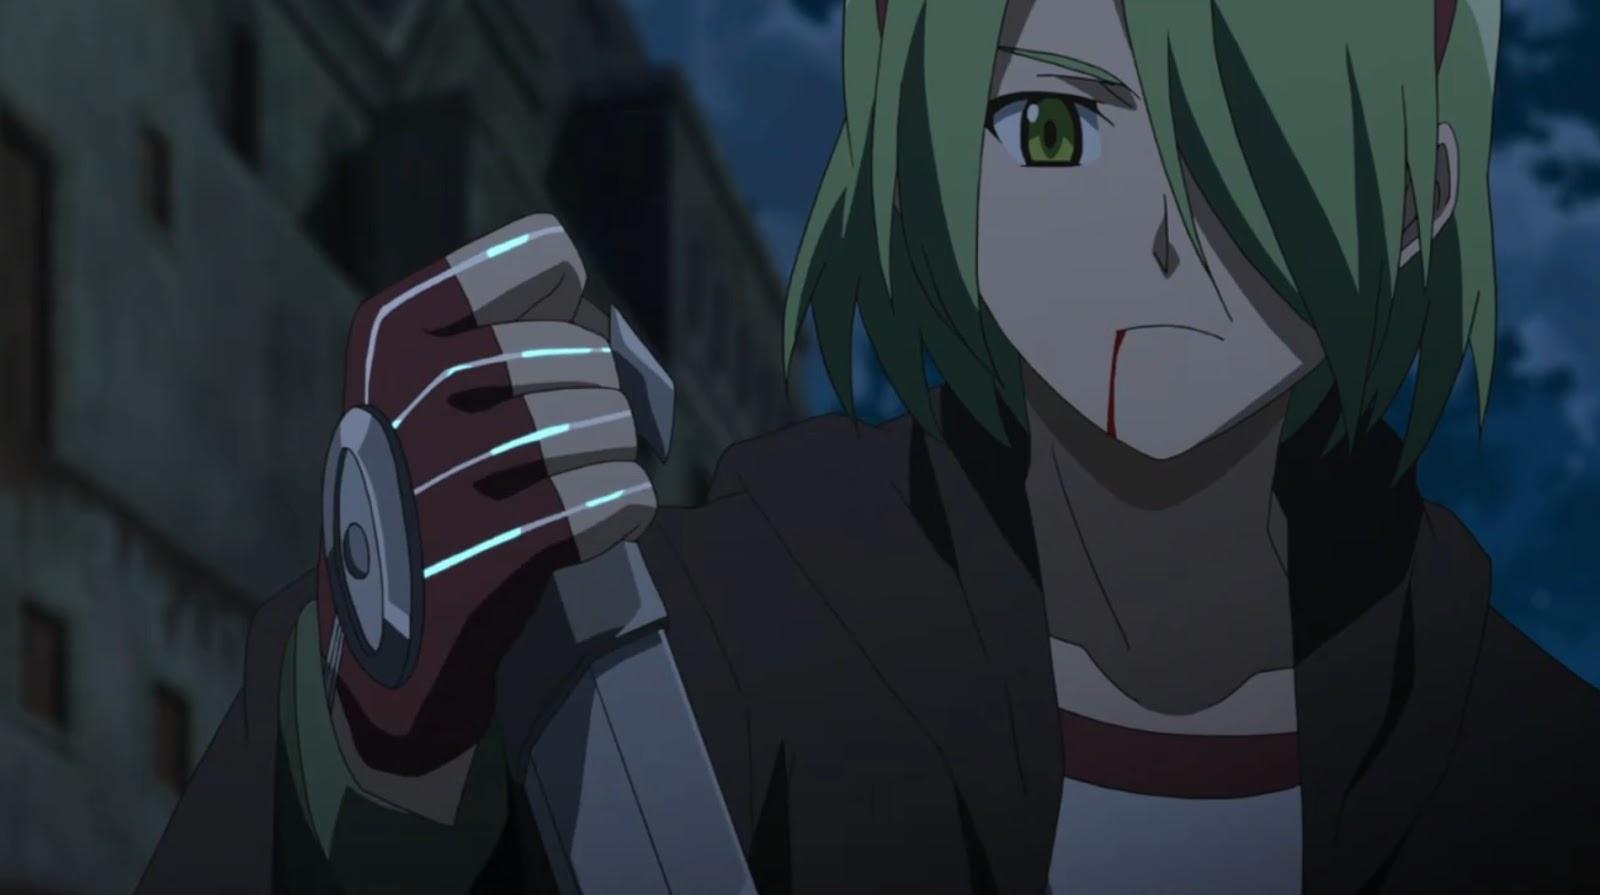 Assistir Akame ga Kill Episódio 18 HD, Akame ga Kill Episódio 18, Akame ga Kill! Episódio 18, Legendado Online, Akame ga Kill Episódio 18 Todos os Episódios